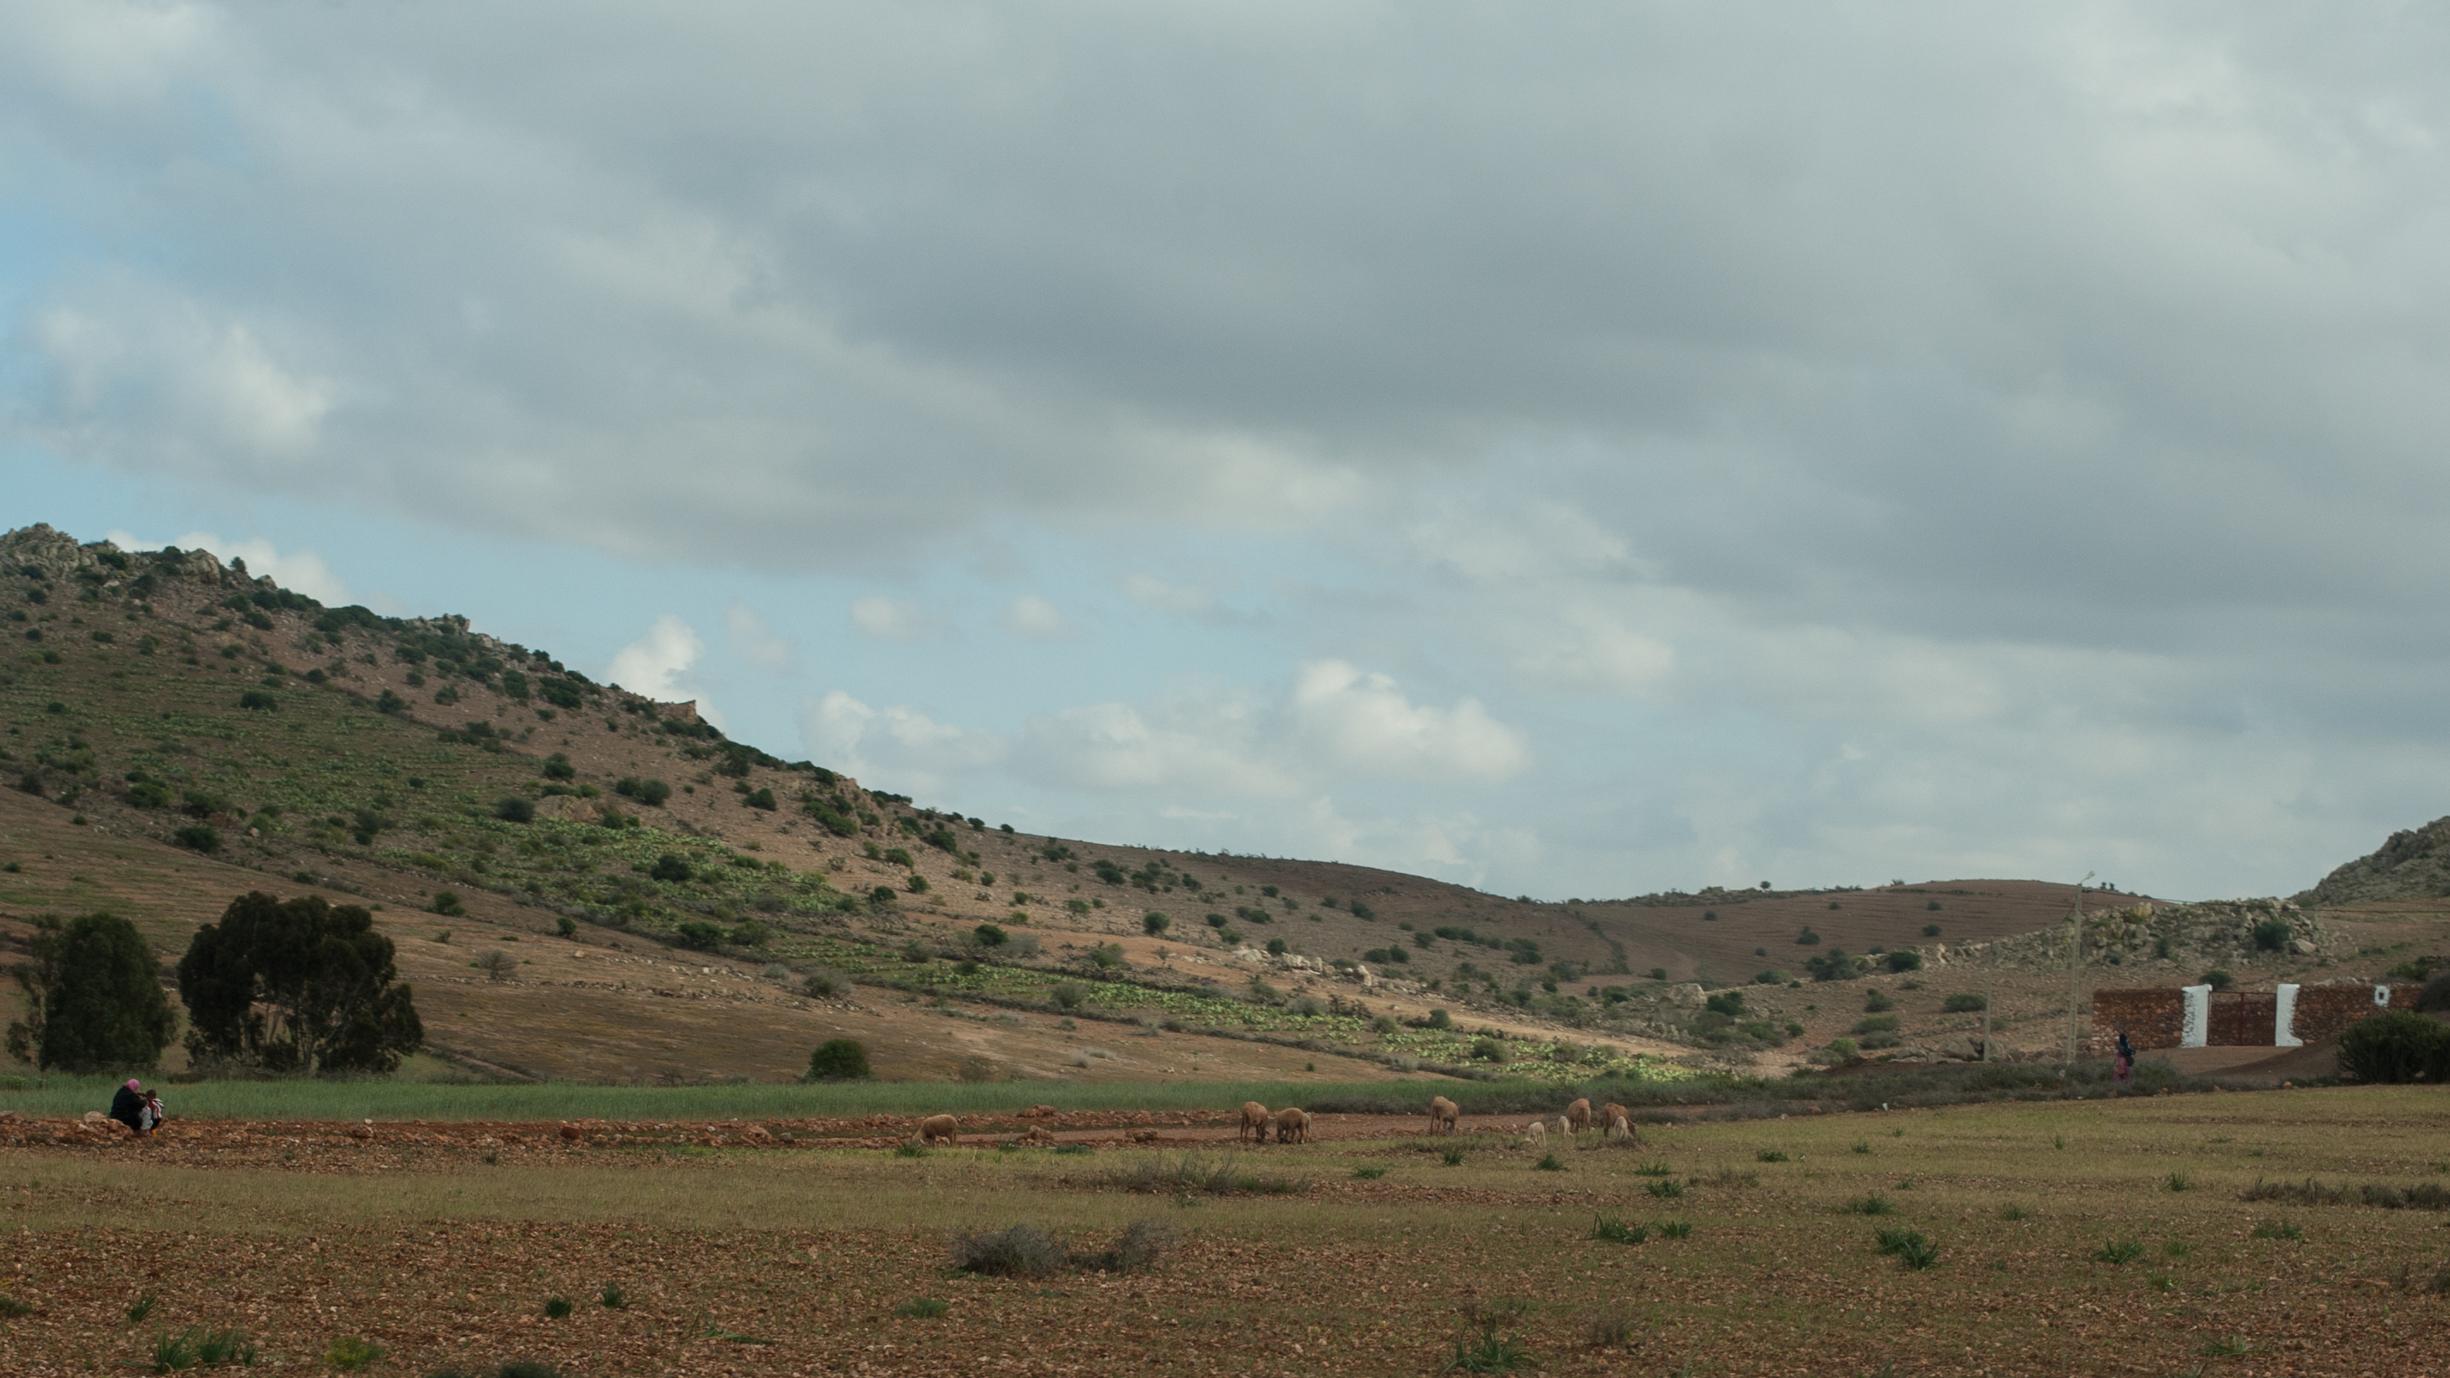 LB3-Morocco-0-day-0252.jpg